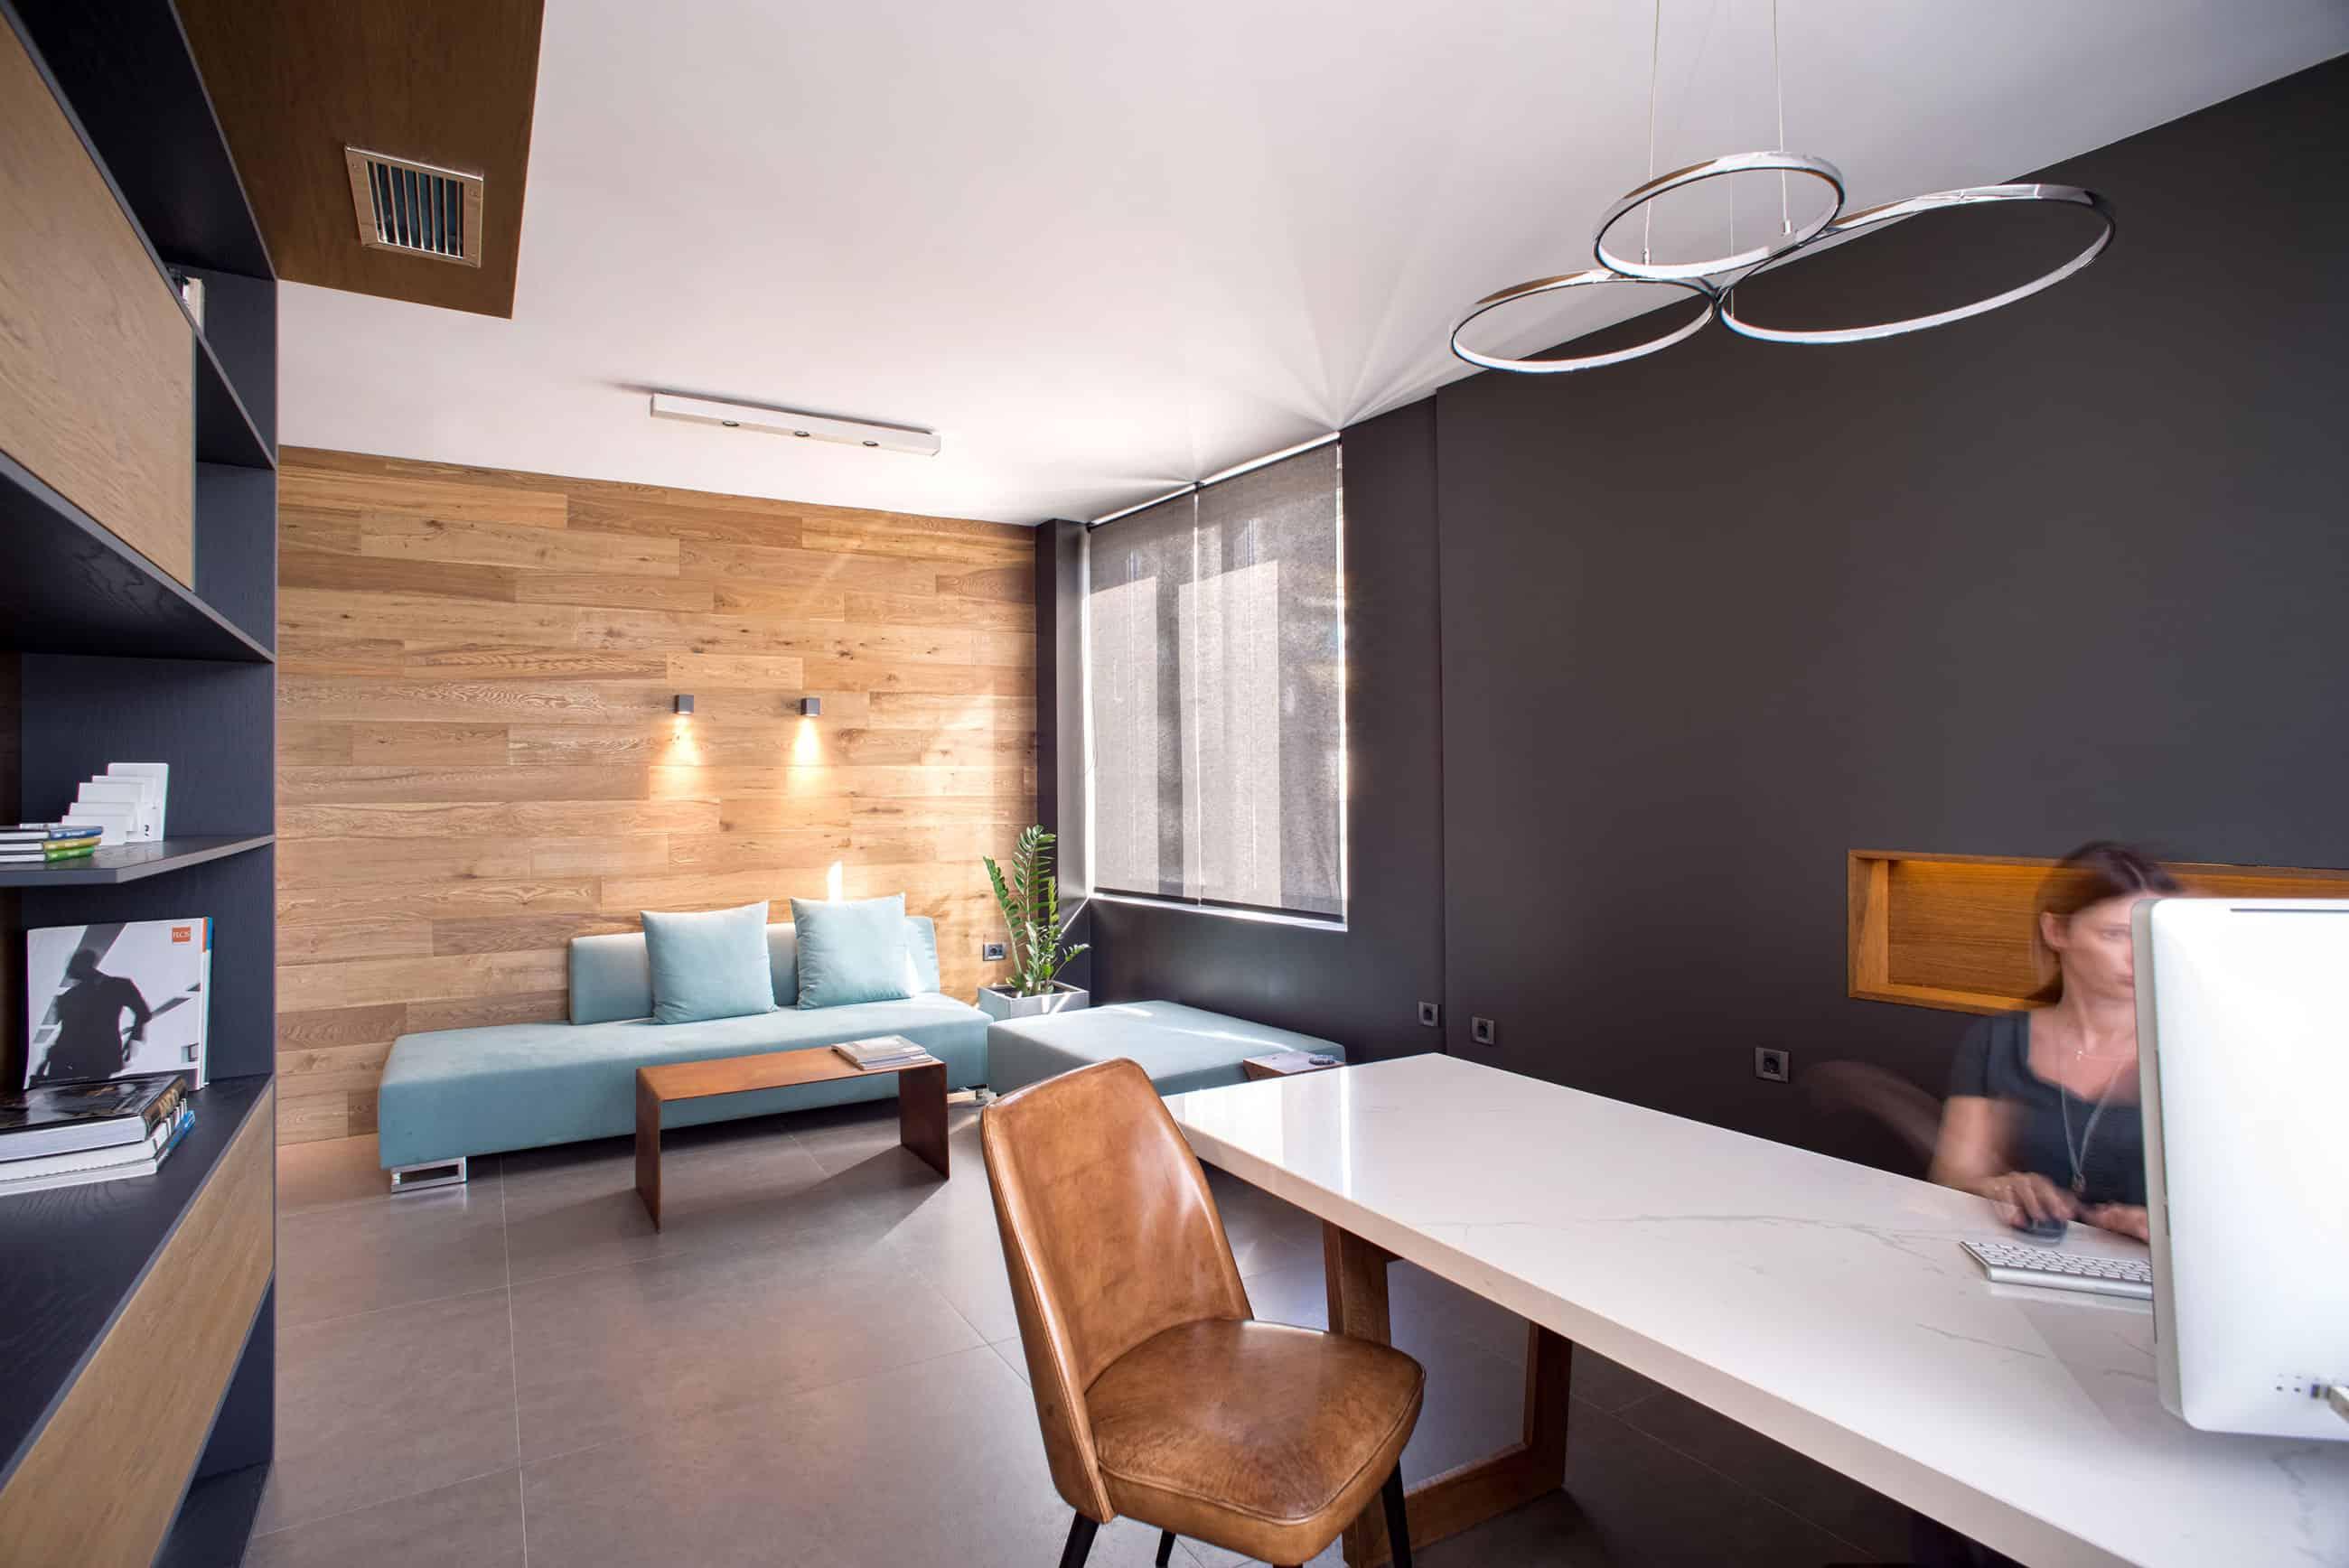 The Stylish Offices of VR Architects in Igoumenitsa, Greece